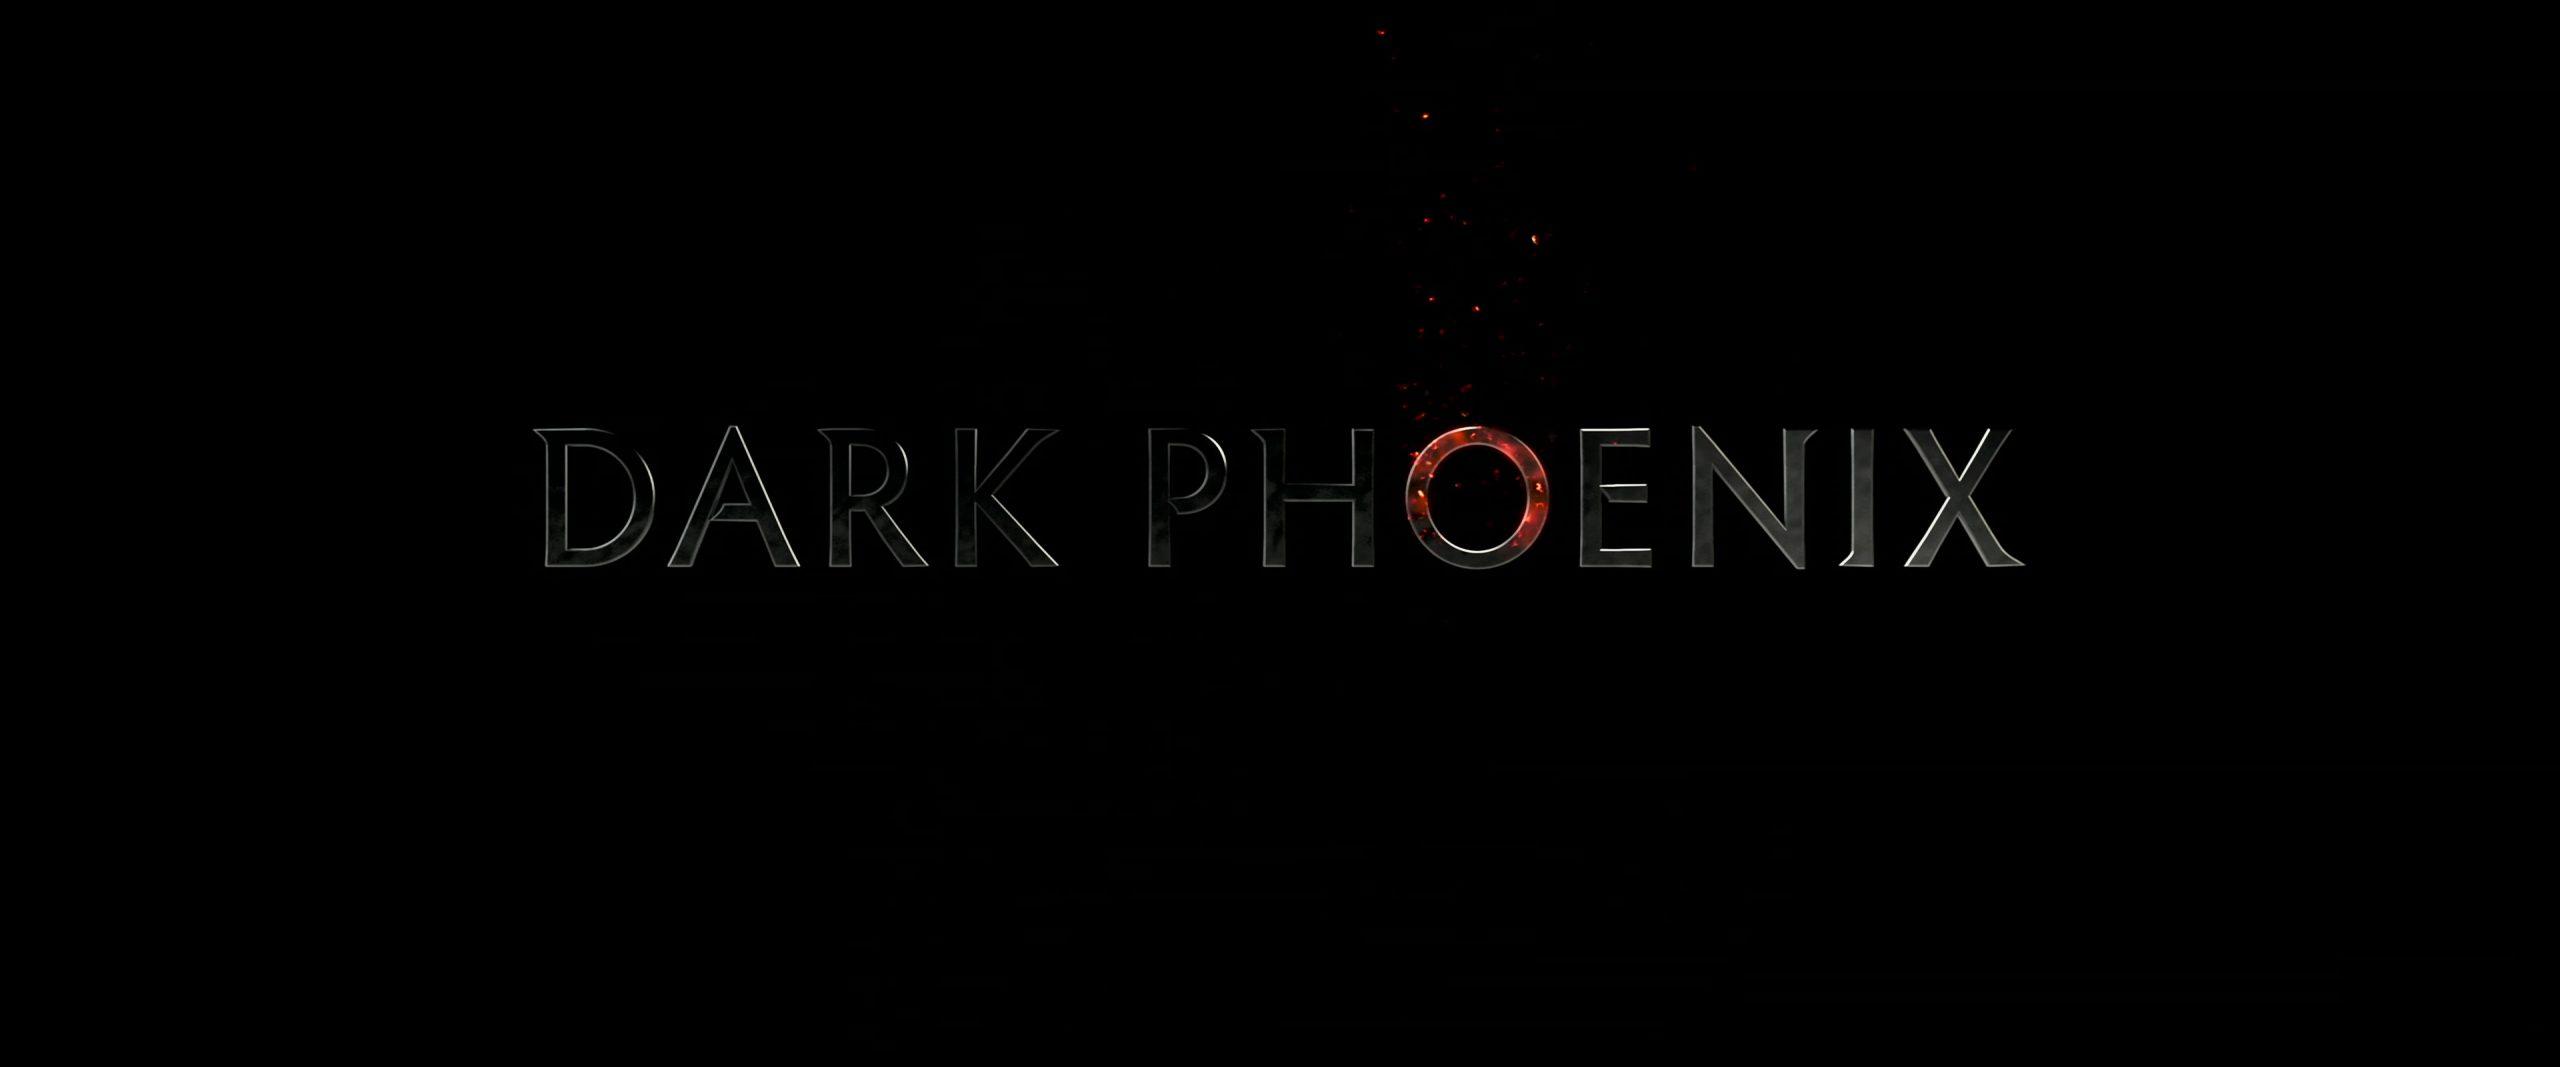 X-Men: Dark Phoenix (2019) [4K]